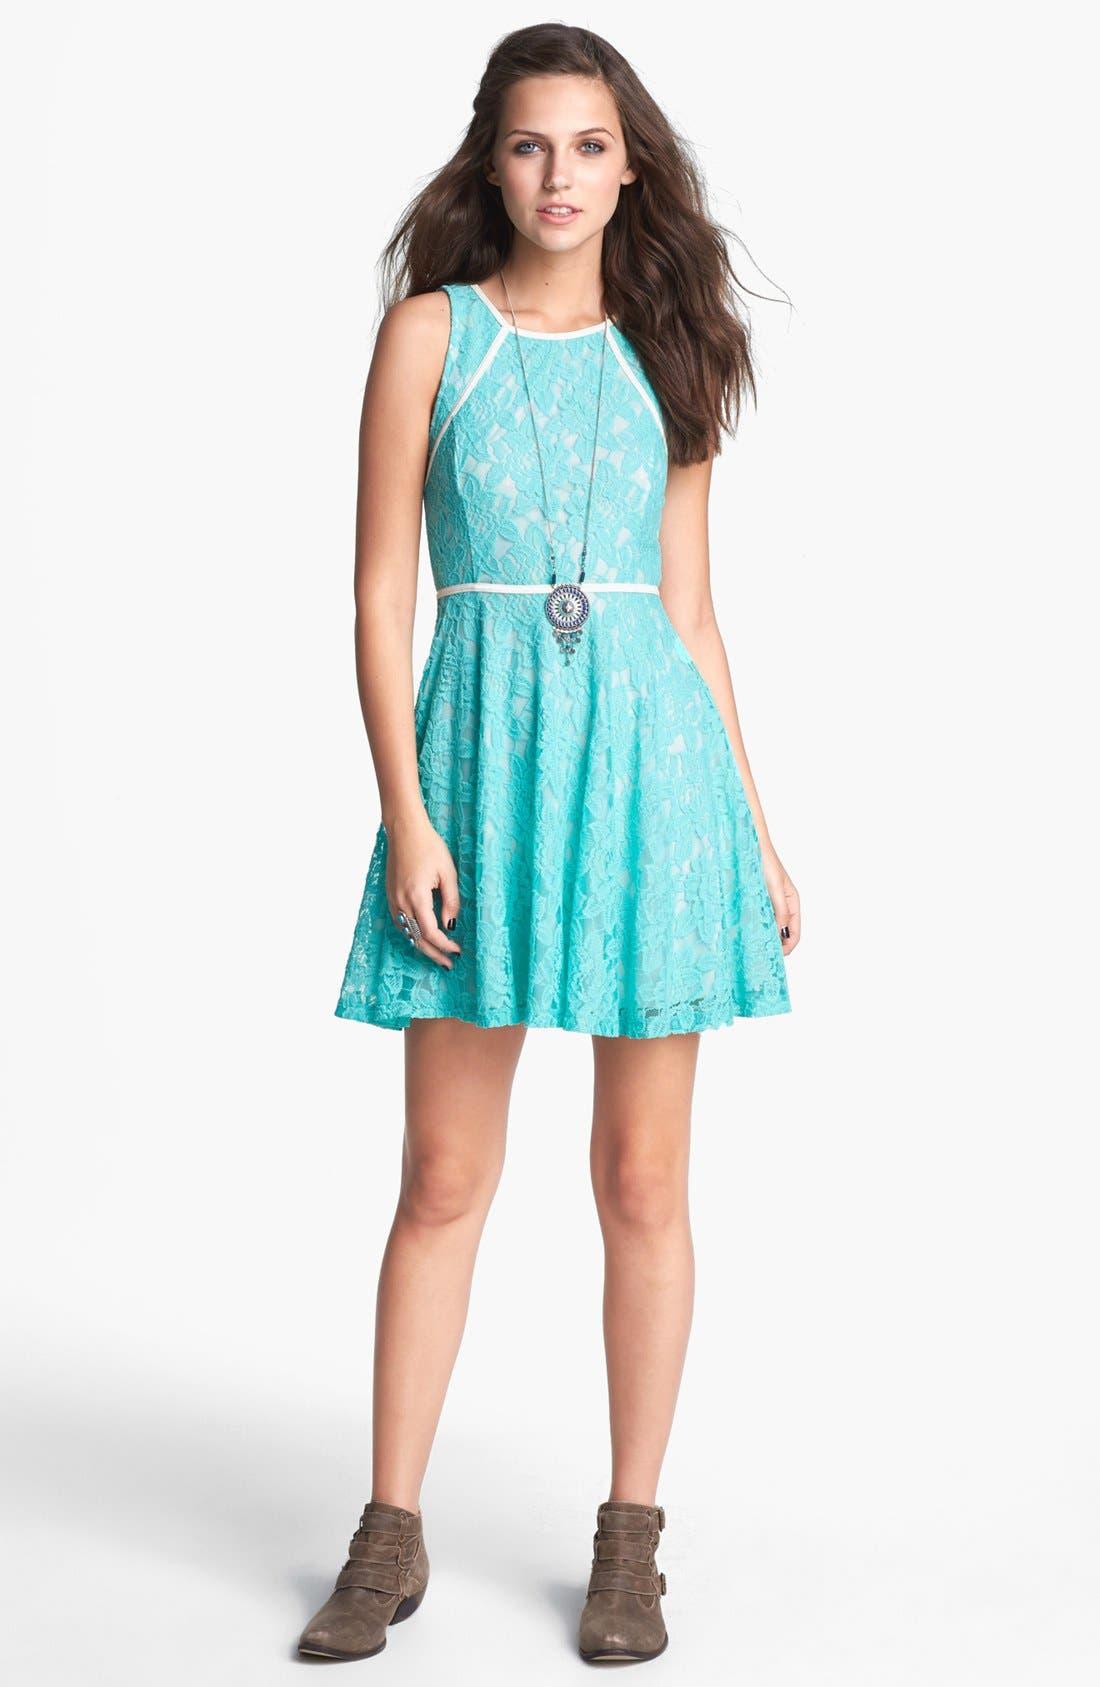 Main Image - Faux Leather Trim Lace Skater Dress